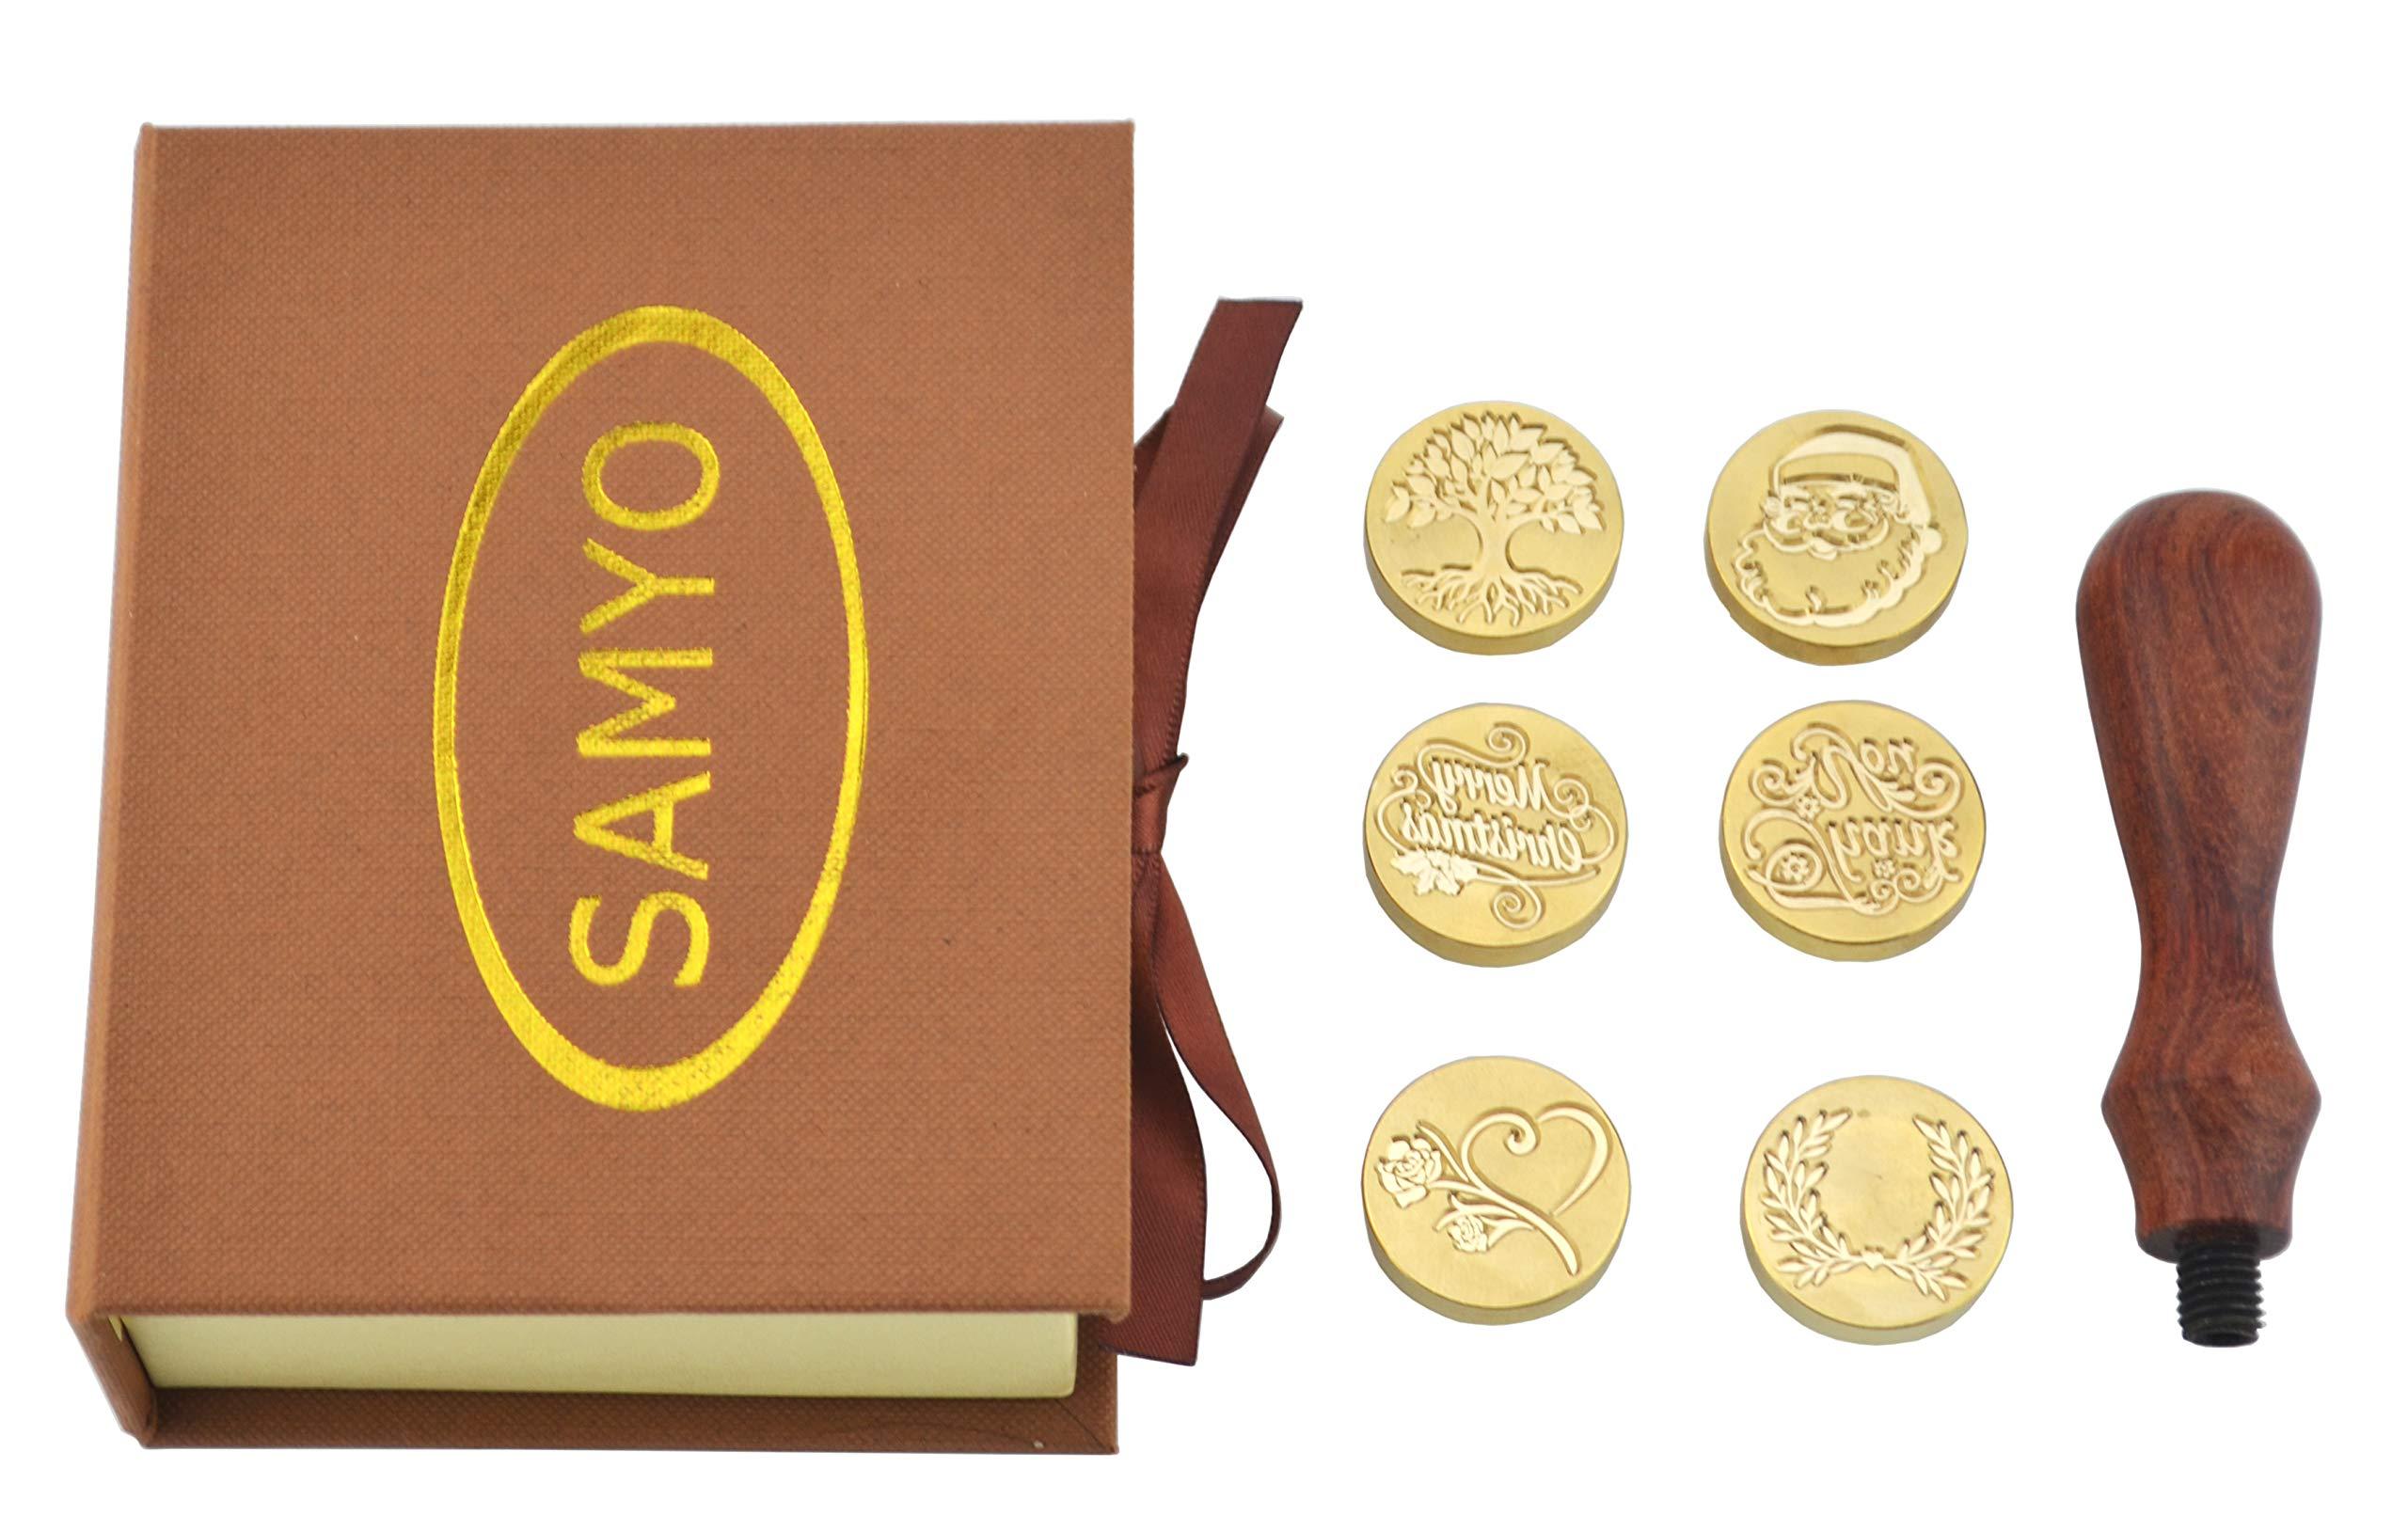 Gift Package Wax Seal Christmas Wax Seal Stamp Wax Sealing Stamp Santa Claus Sealing Wax Stamp Christmas Gift Wax Seal Kit